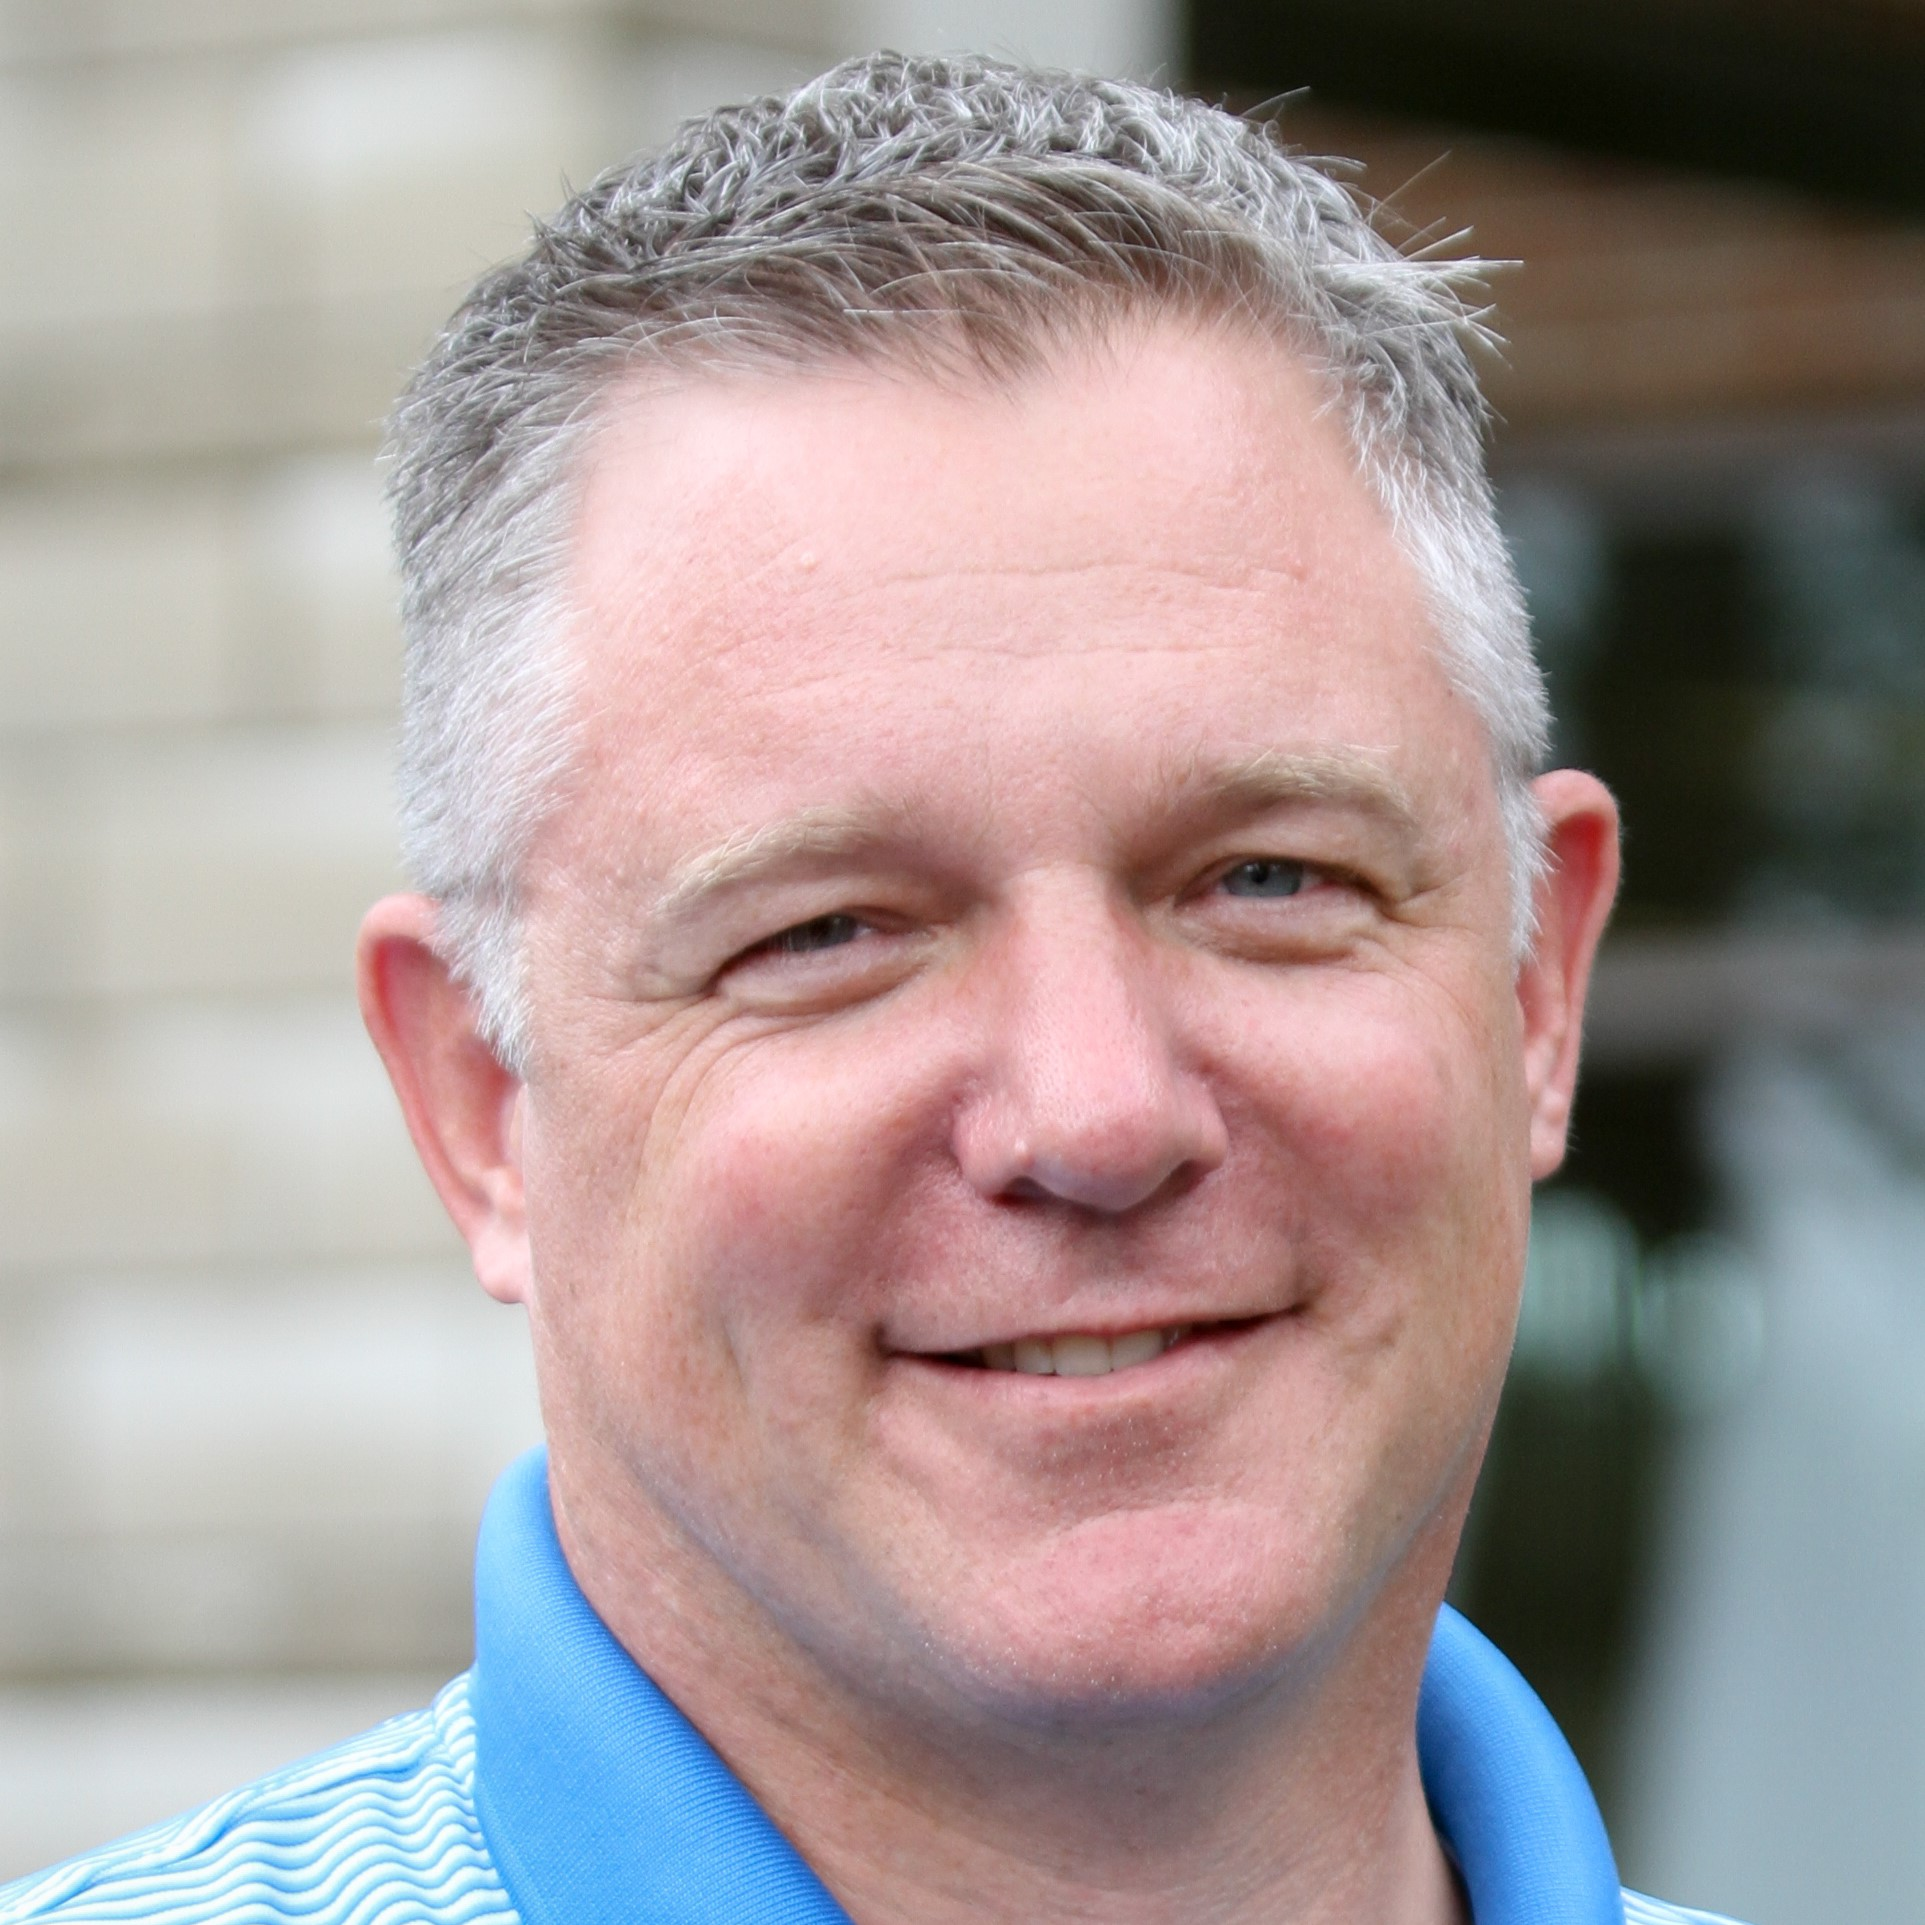 Michael Whittaker